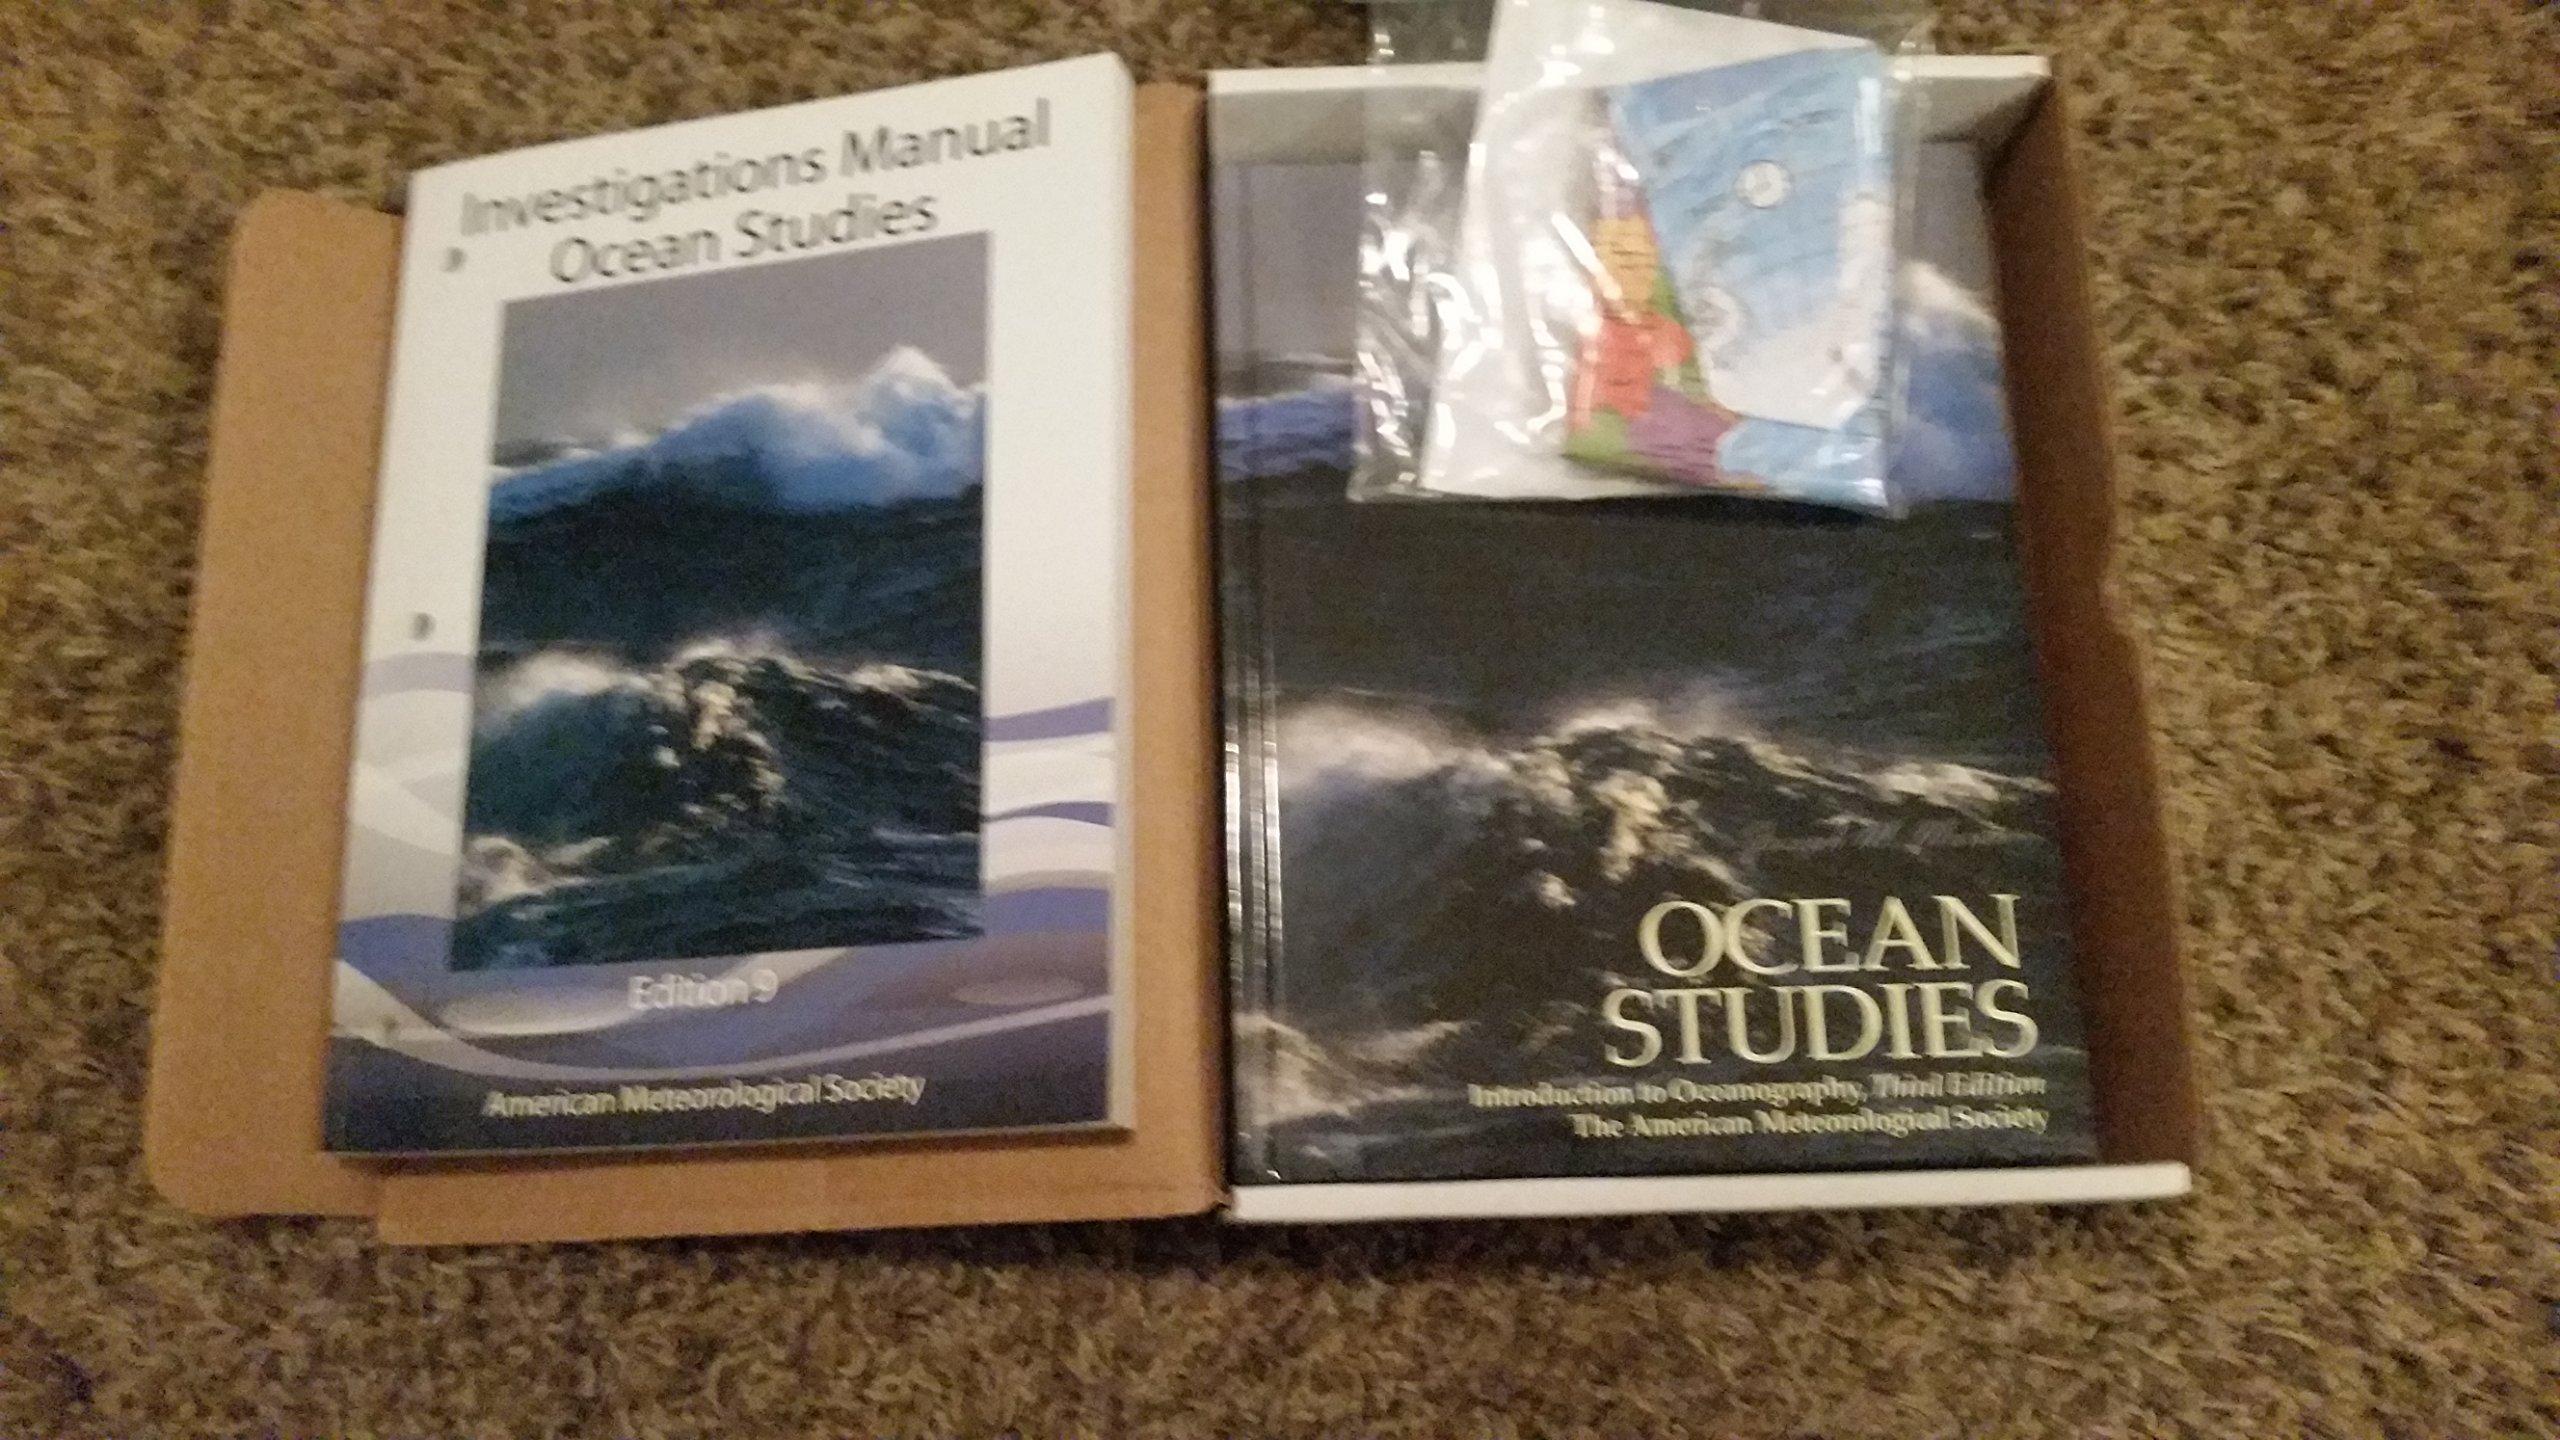 Ocean Studies Student Package 9th Edition: Joseph M. Moran: 9781935704966:  Amazon.com: Books